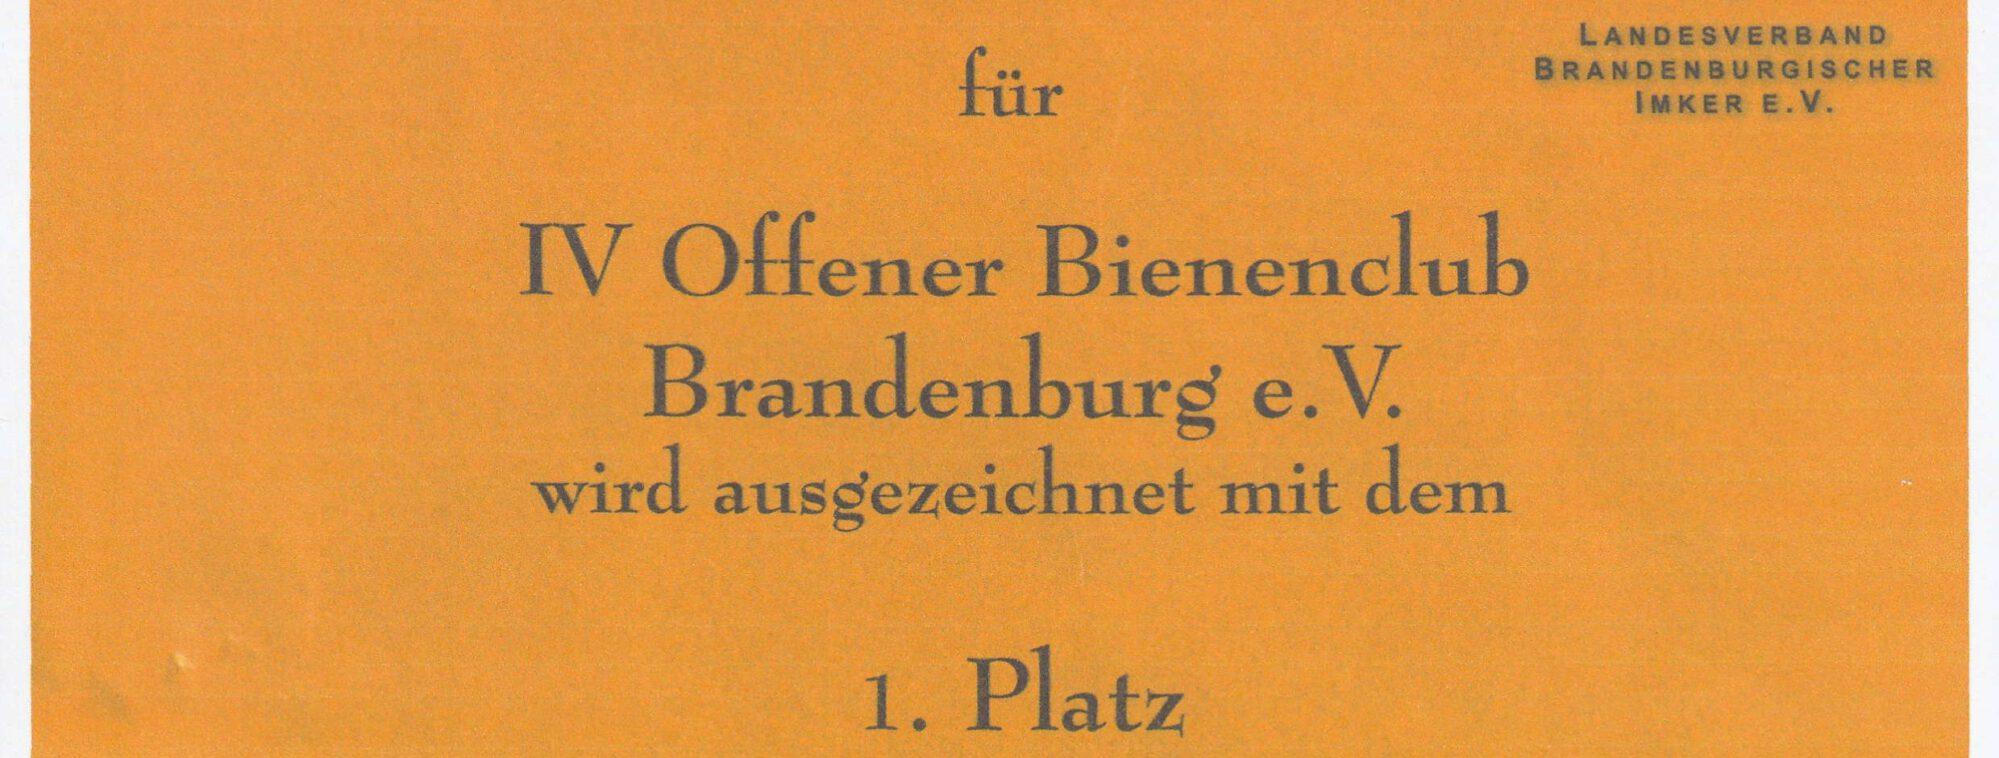 Offener BienenClub Brandenburg e.V